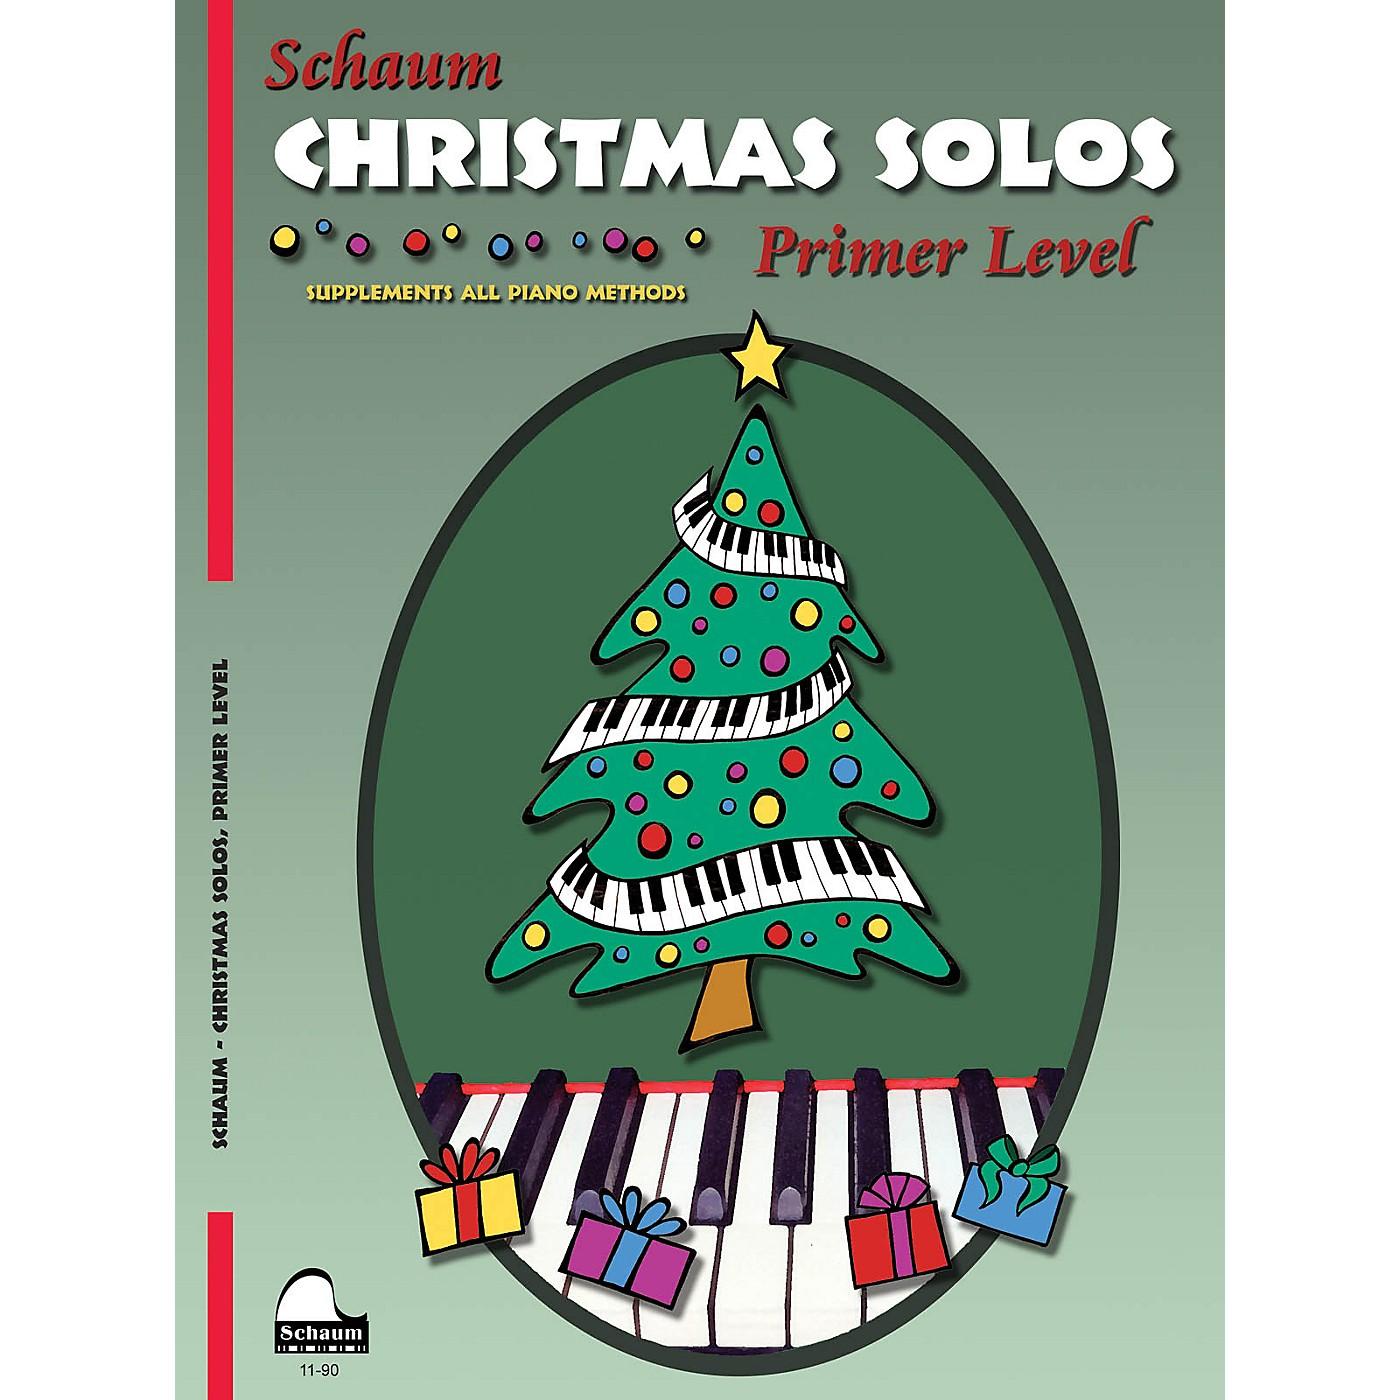 SCHAUM Christmas Solos (Primer Level Early Elem Level) Educational Piano Book thumbnail